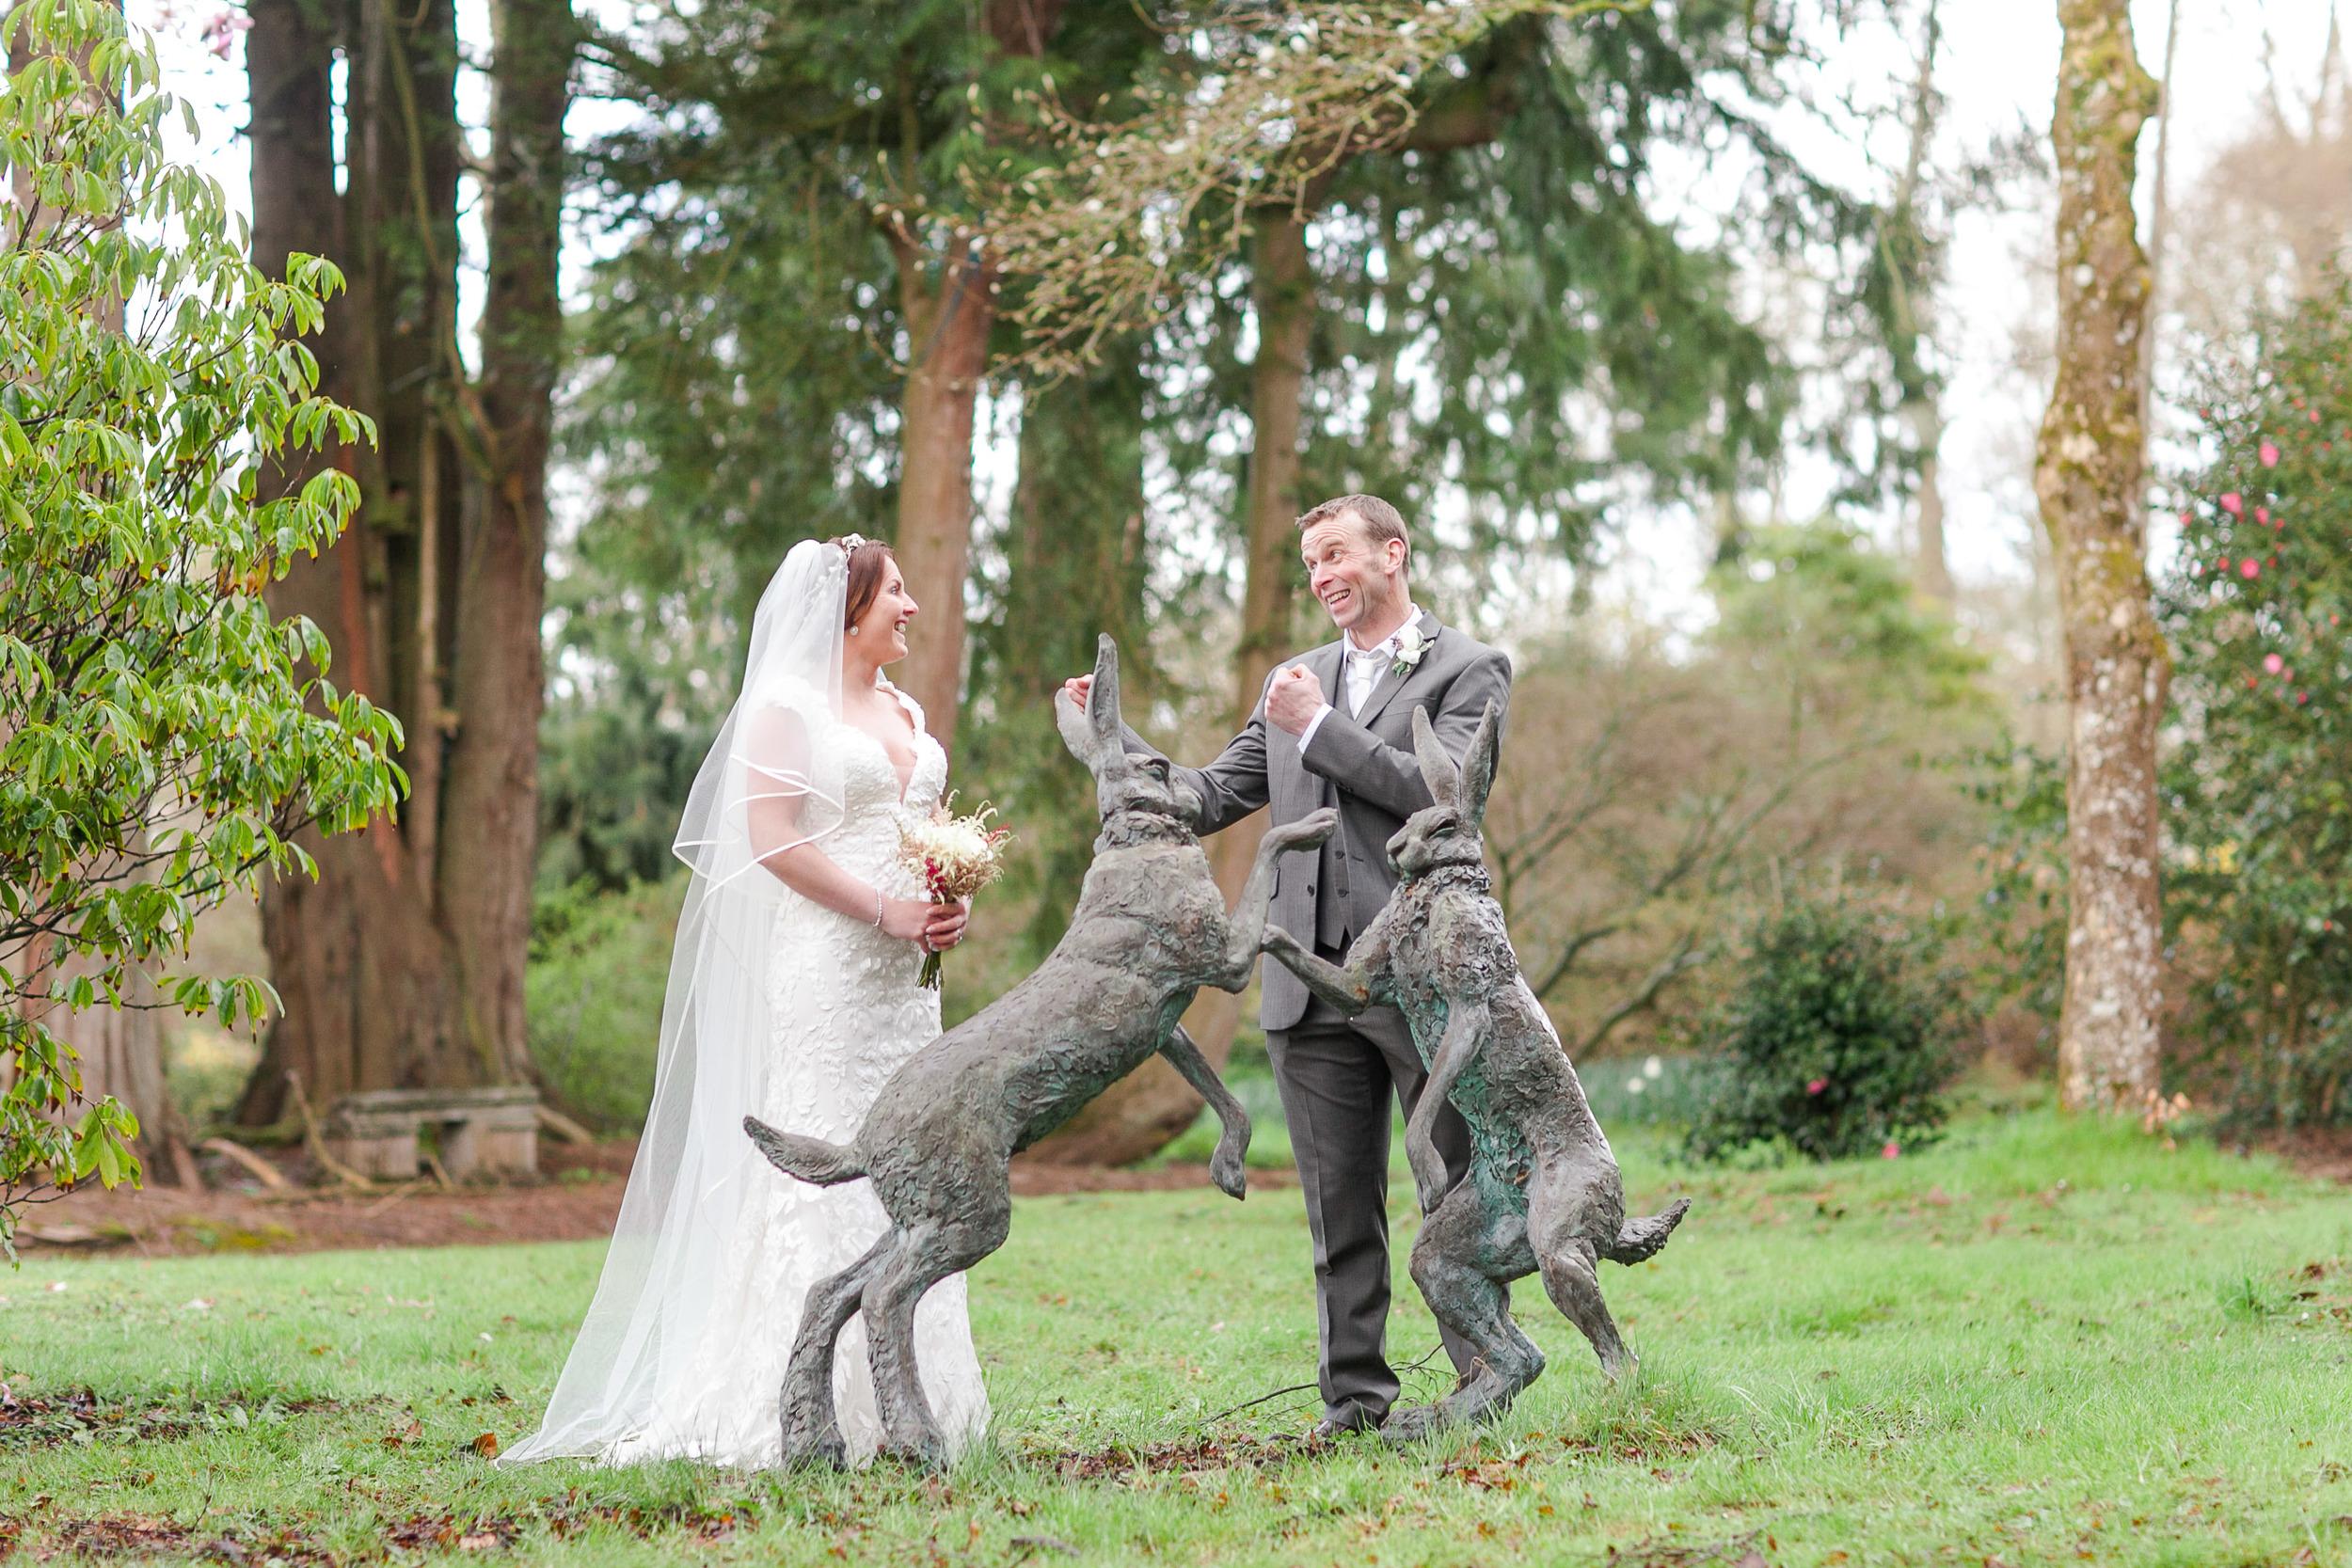 Ireland-Kildare-Wedding-Photographer-0059.jpg